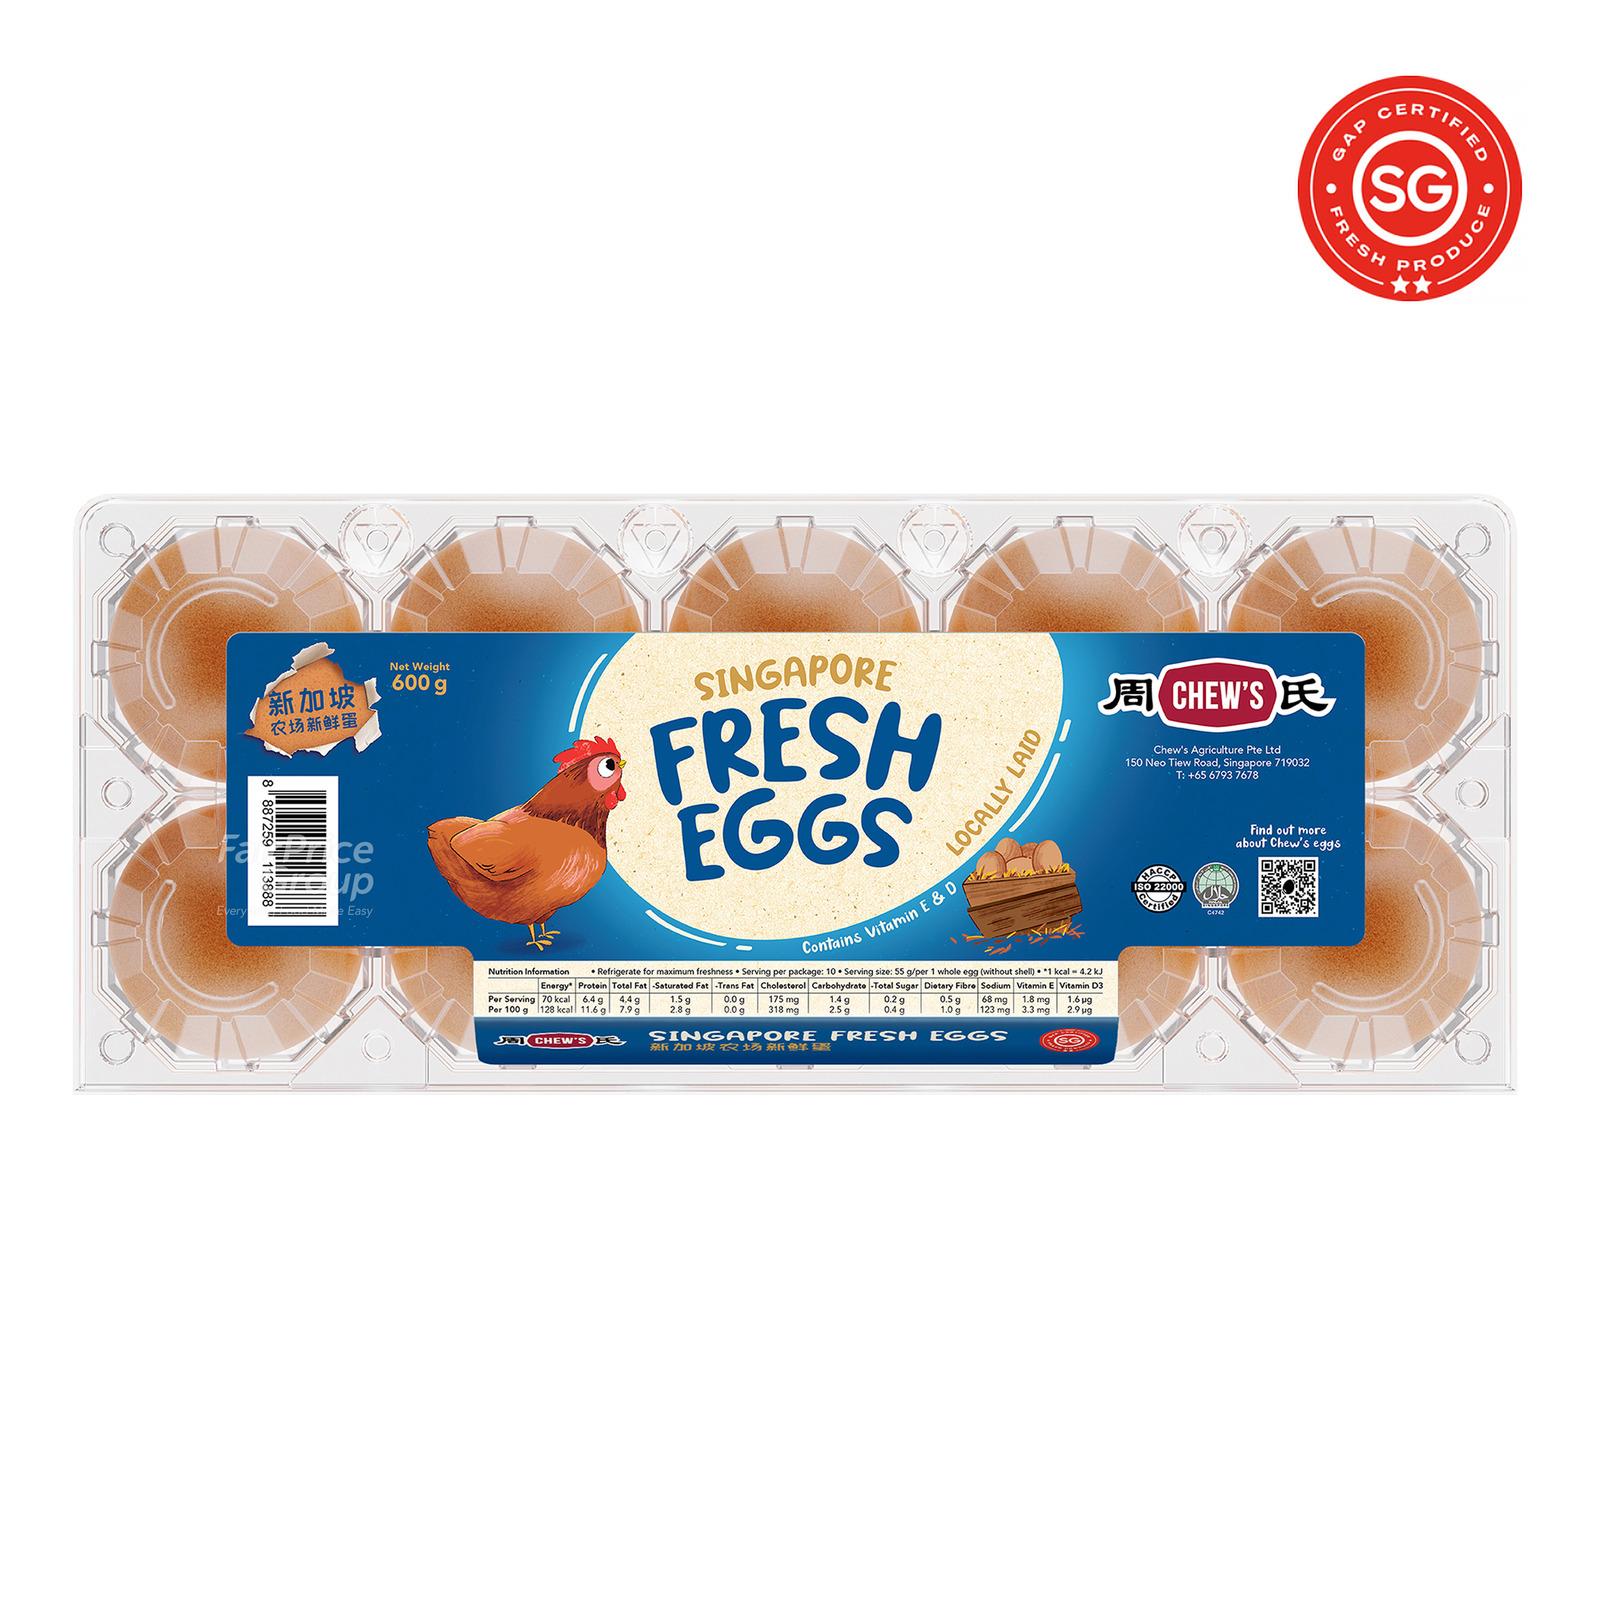 Chew's Fresh Eggs